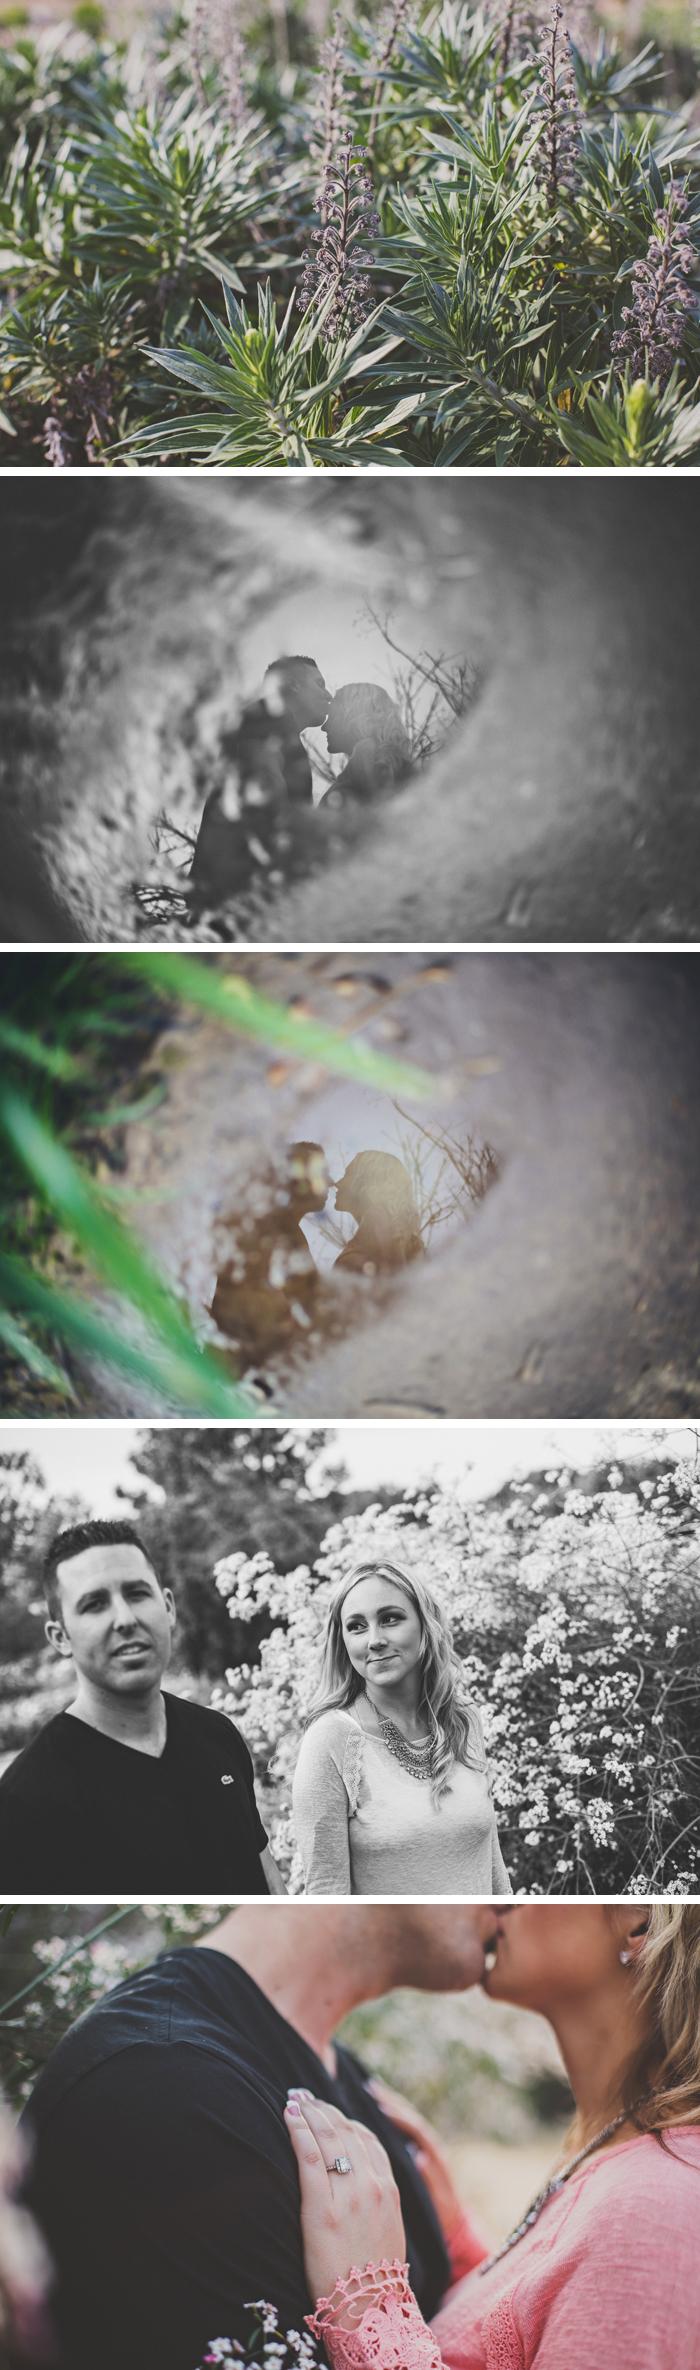 Fullerton Arboretum Engagement Photography